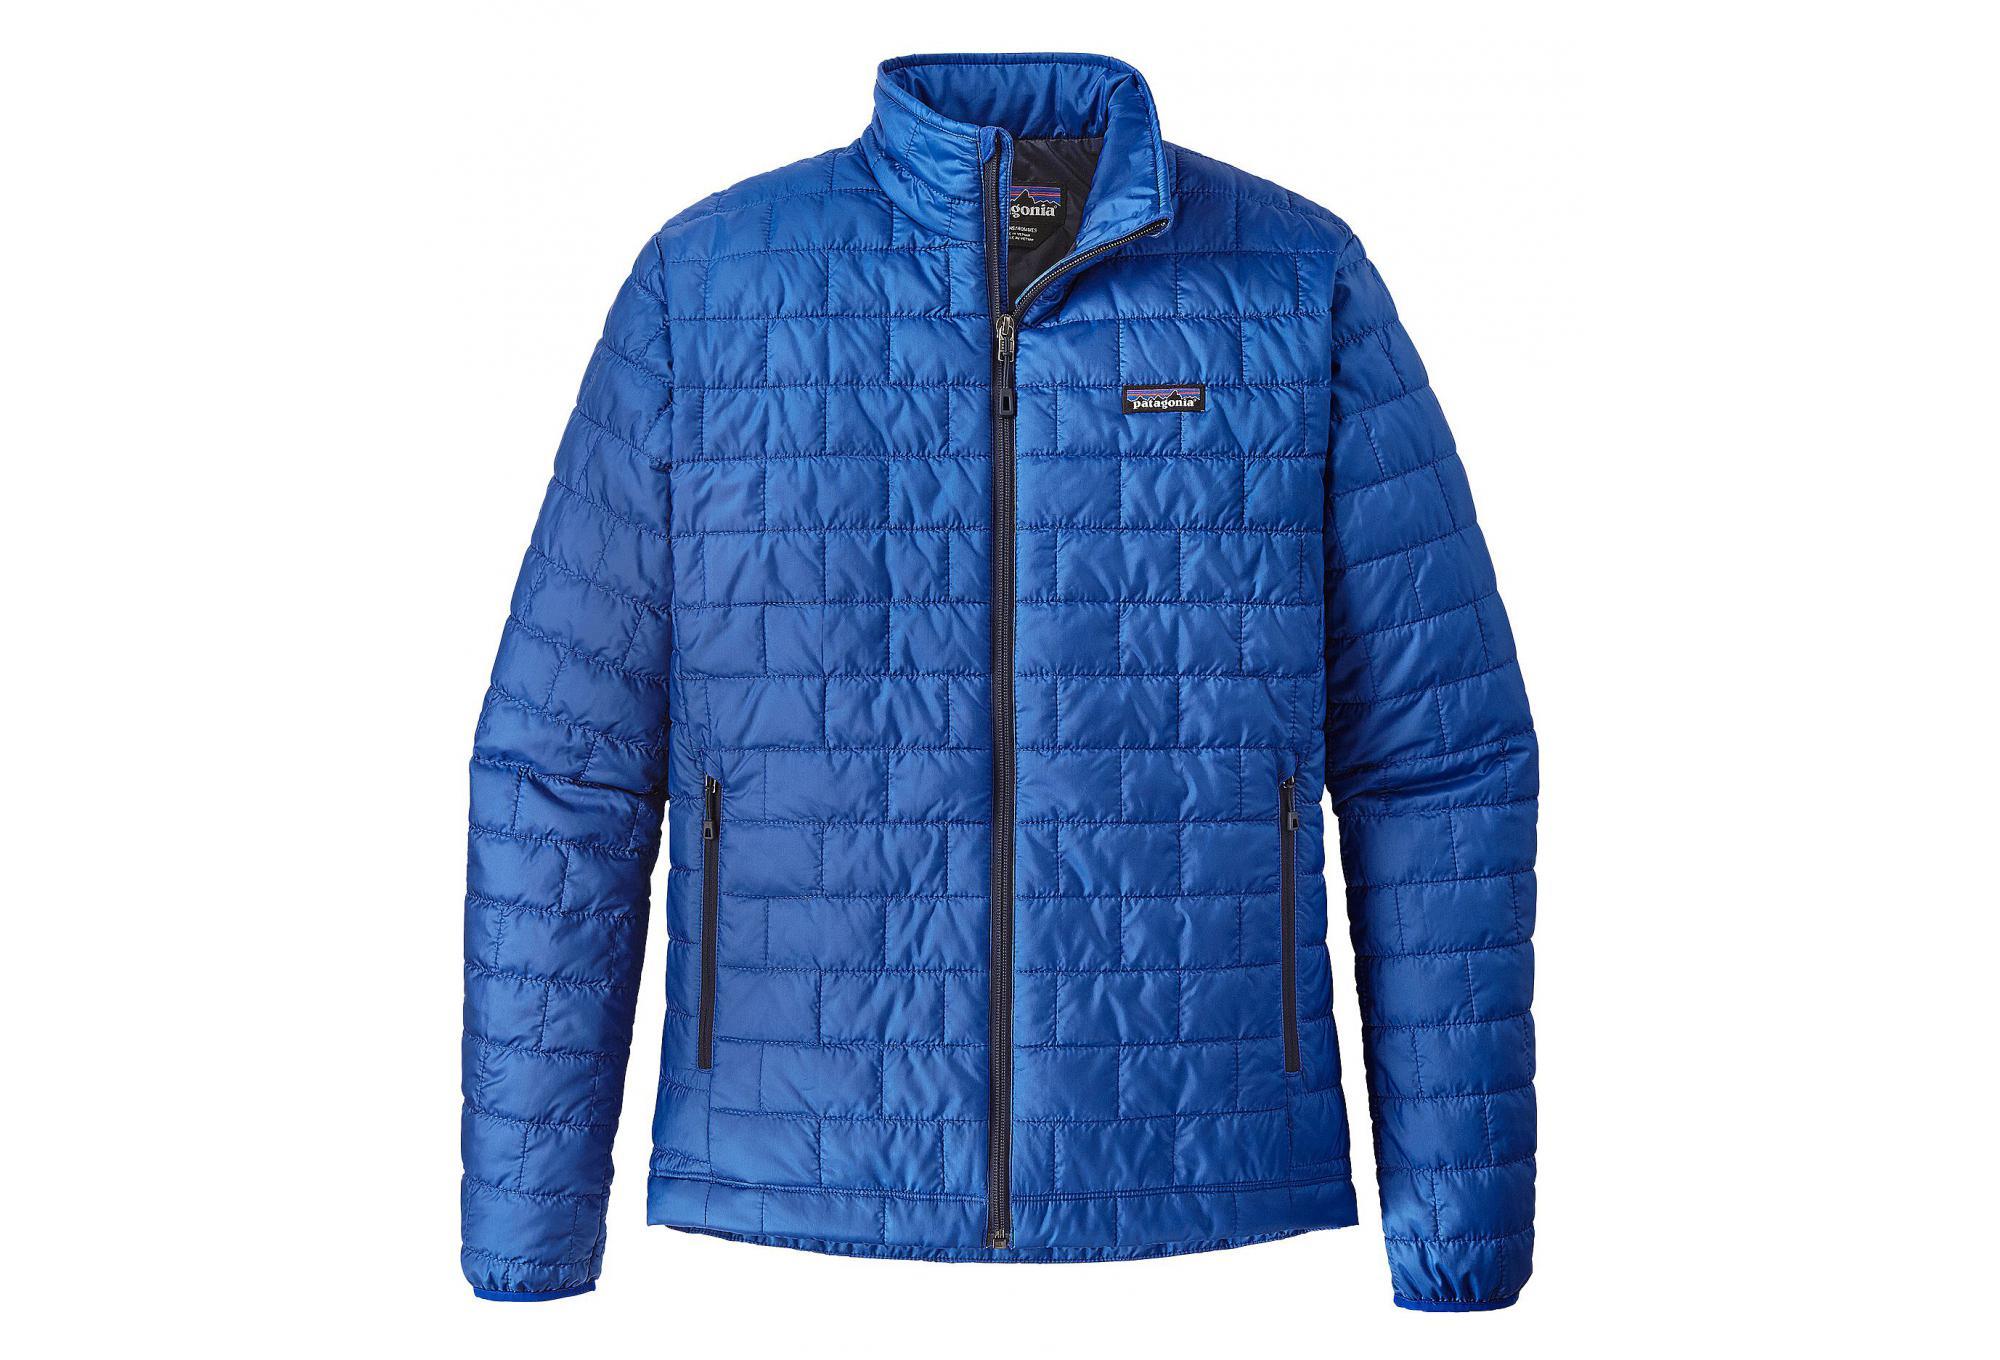 585f24248bf Doudoune Patagonia Nano Puff Bleu